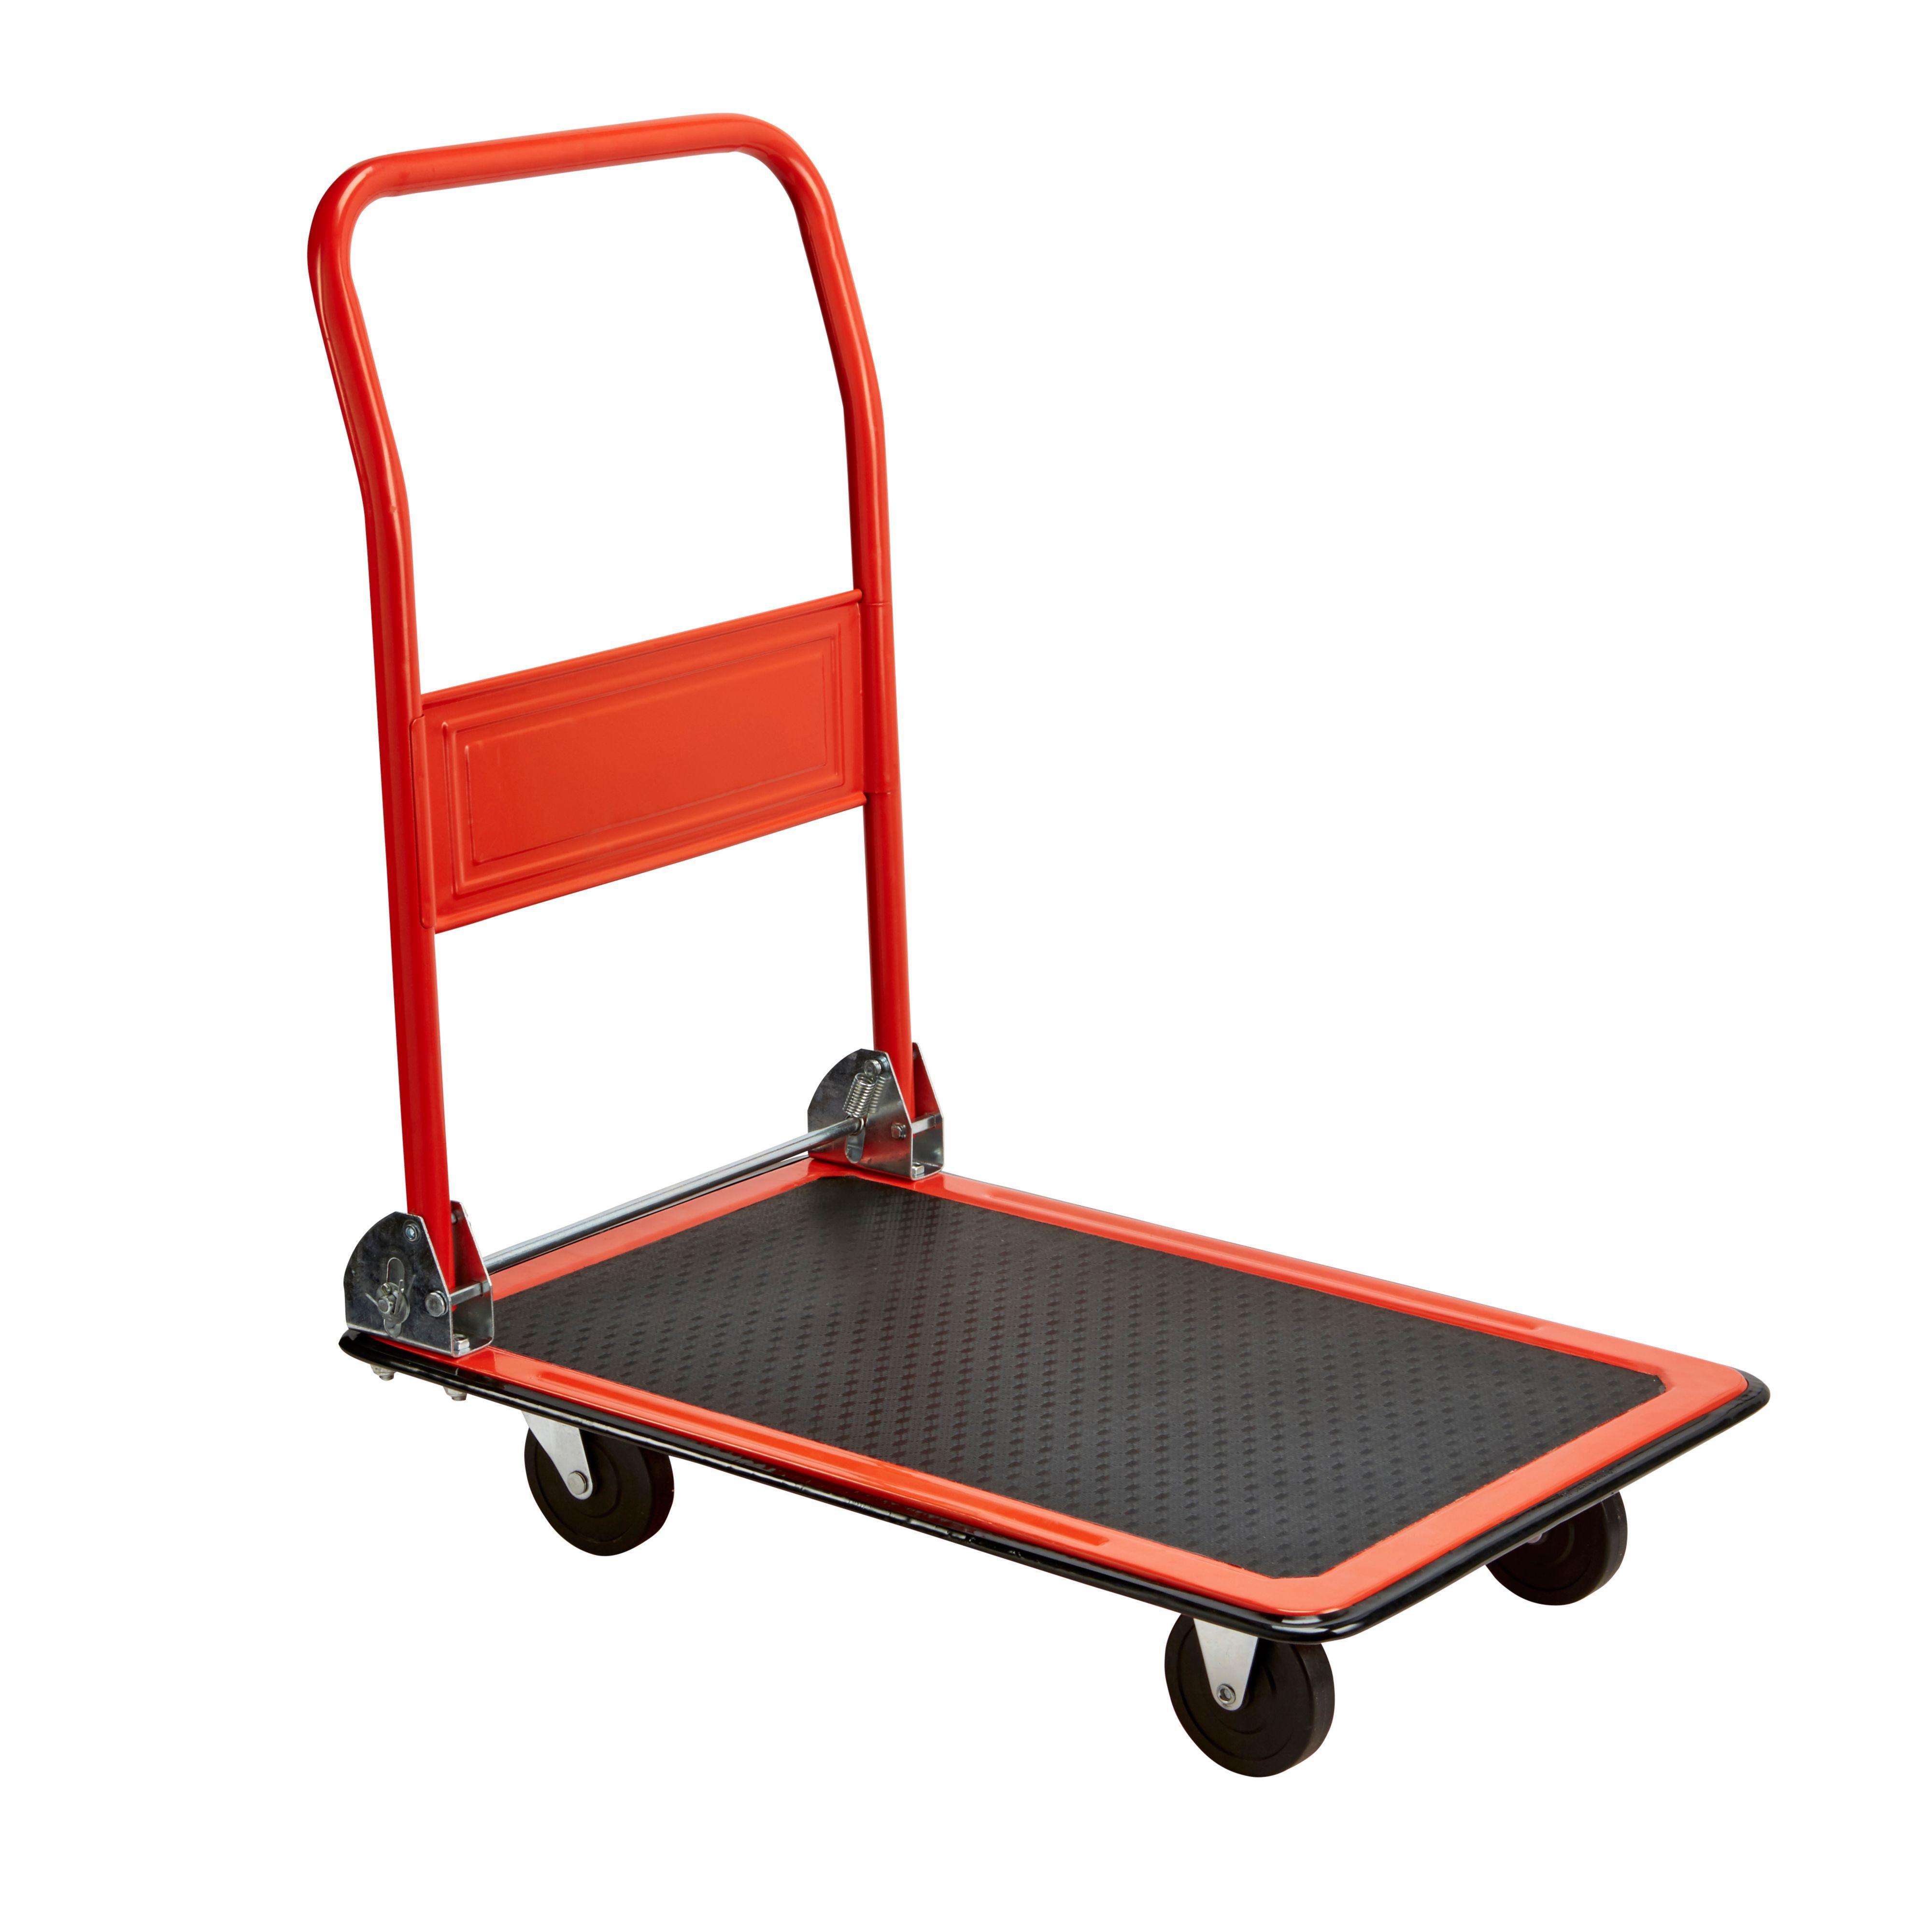 General Purpose Platform Trolley Max Weight 150kg